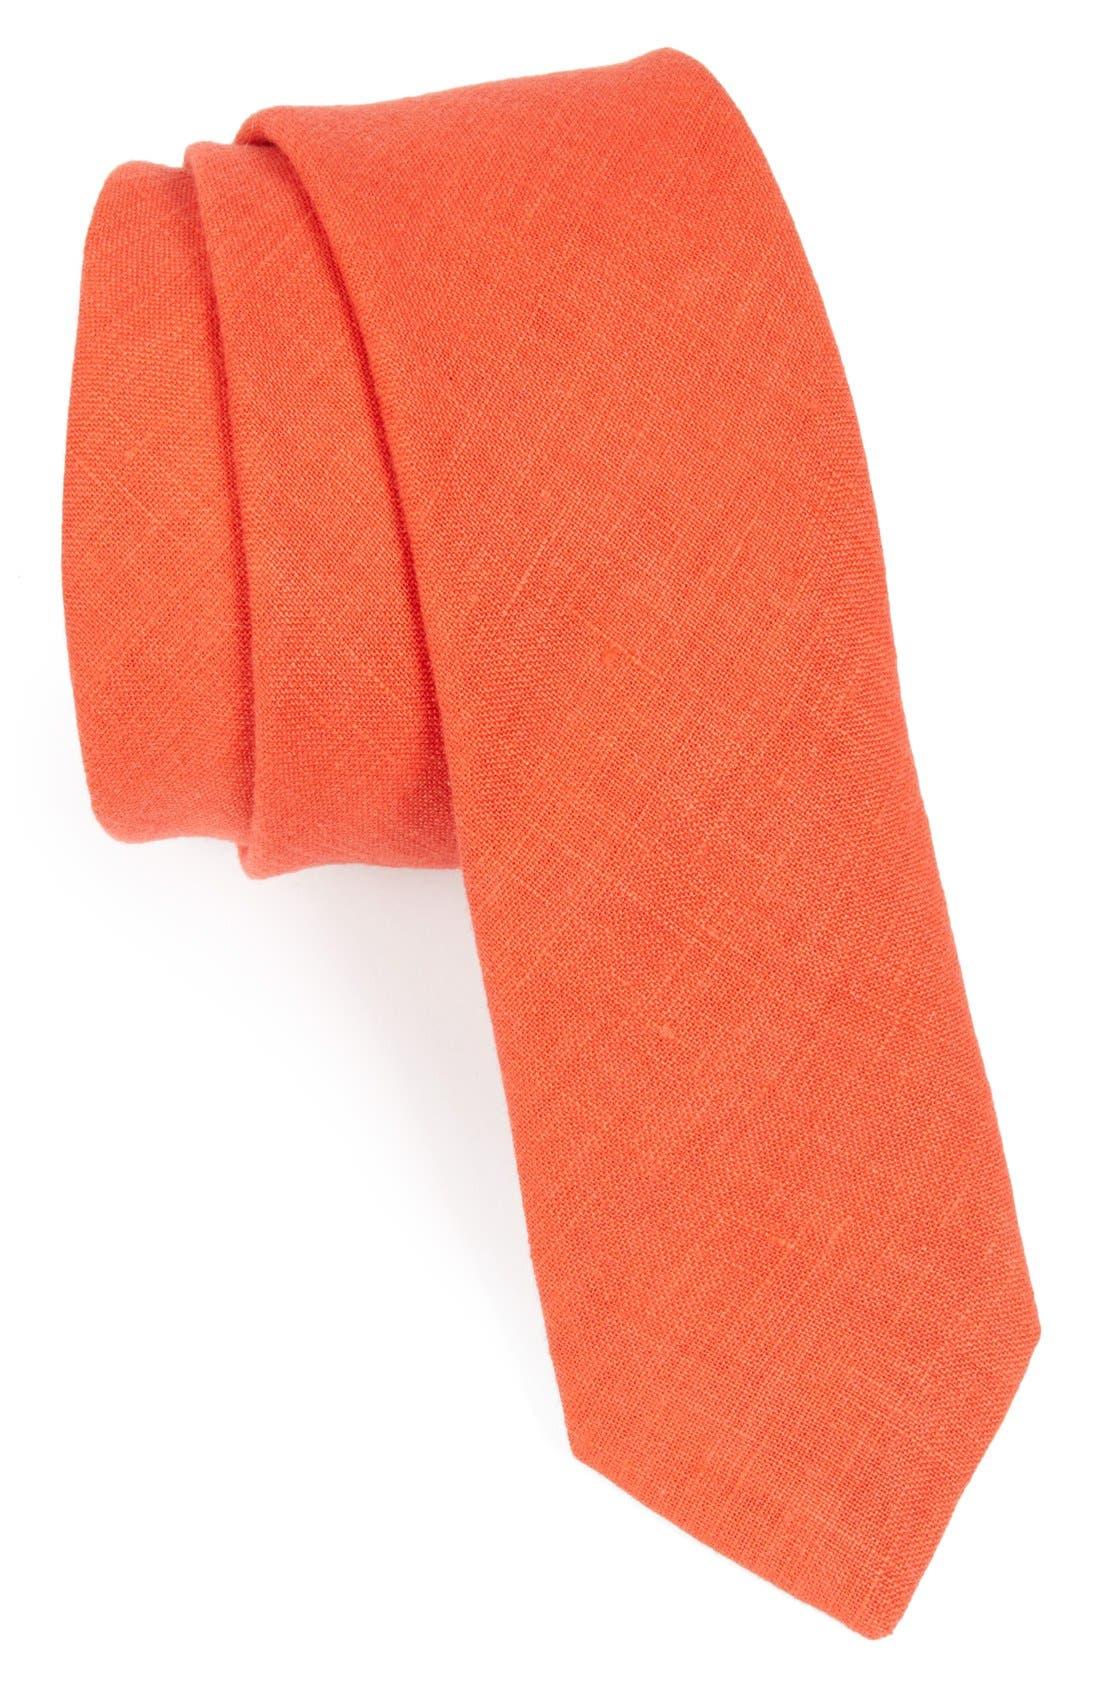 Main Image - Burberry Prorsum Woven Linen Tie